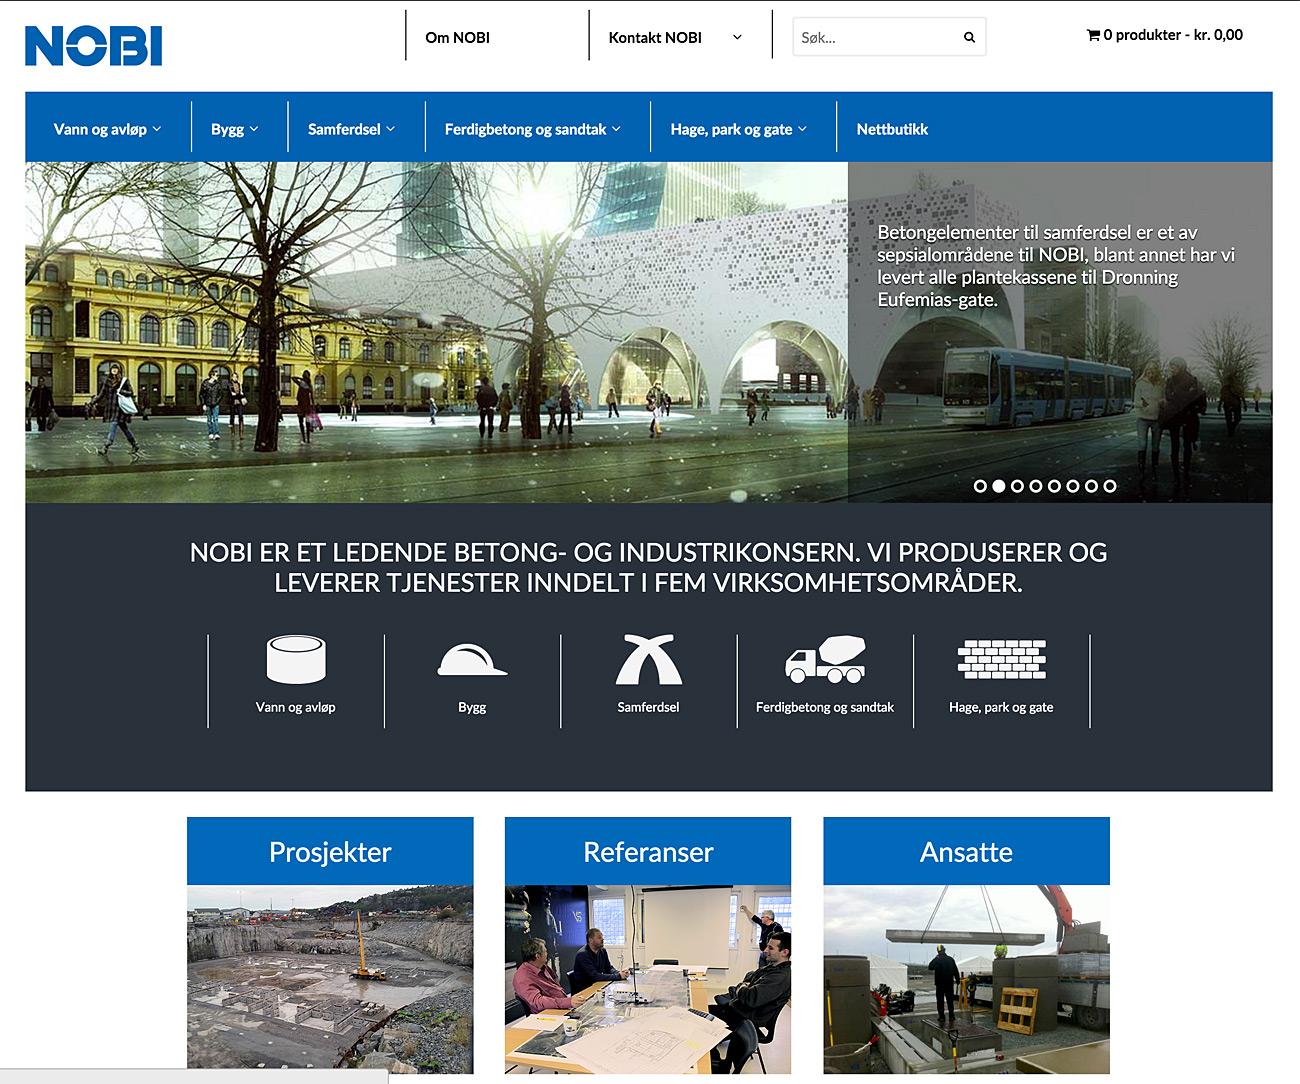 d696cb733 Nobi – Norsk betongindustri - Senson AS - WordPress / WooCommerce ...